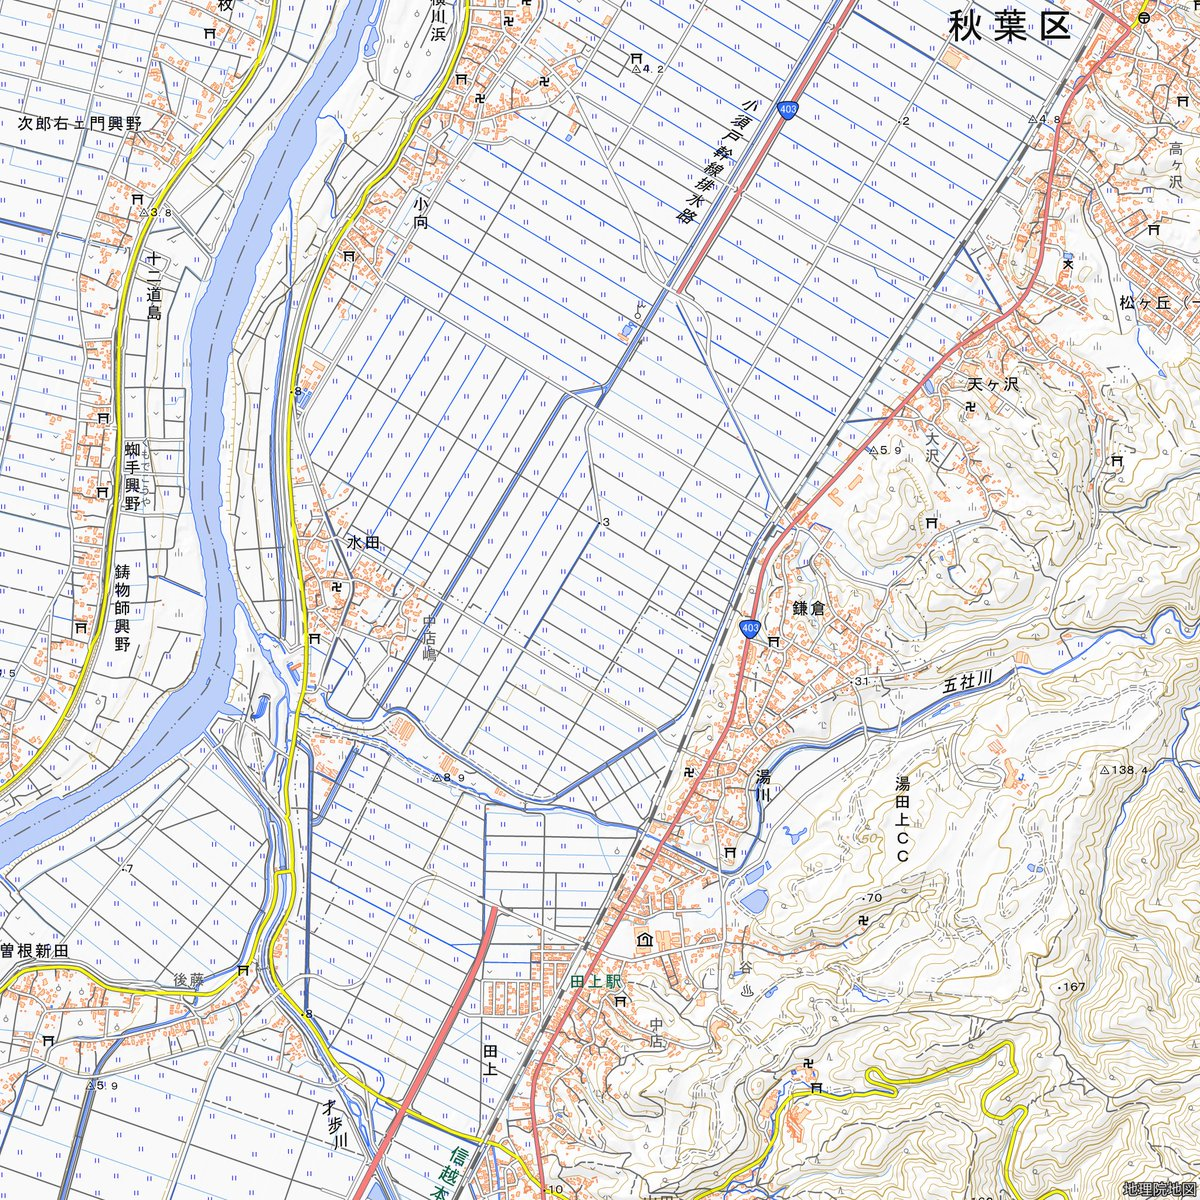 地理 院 地図 vector